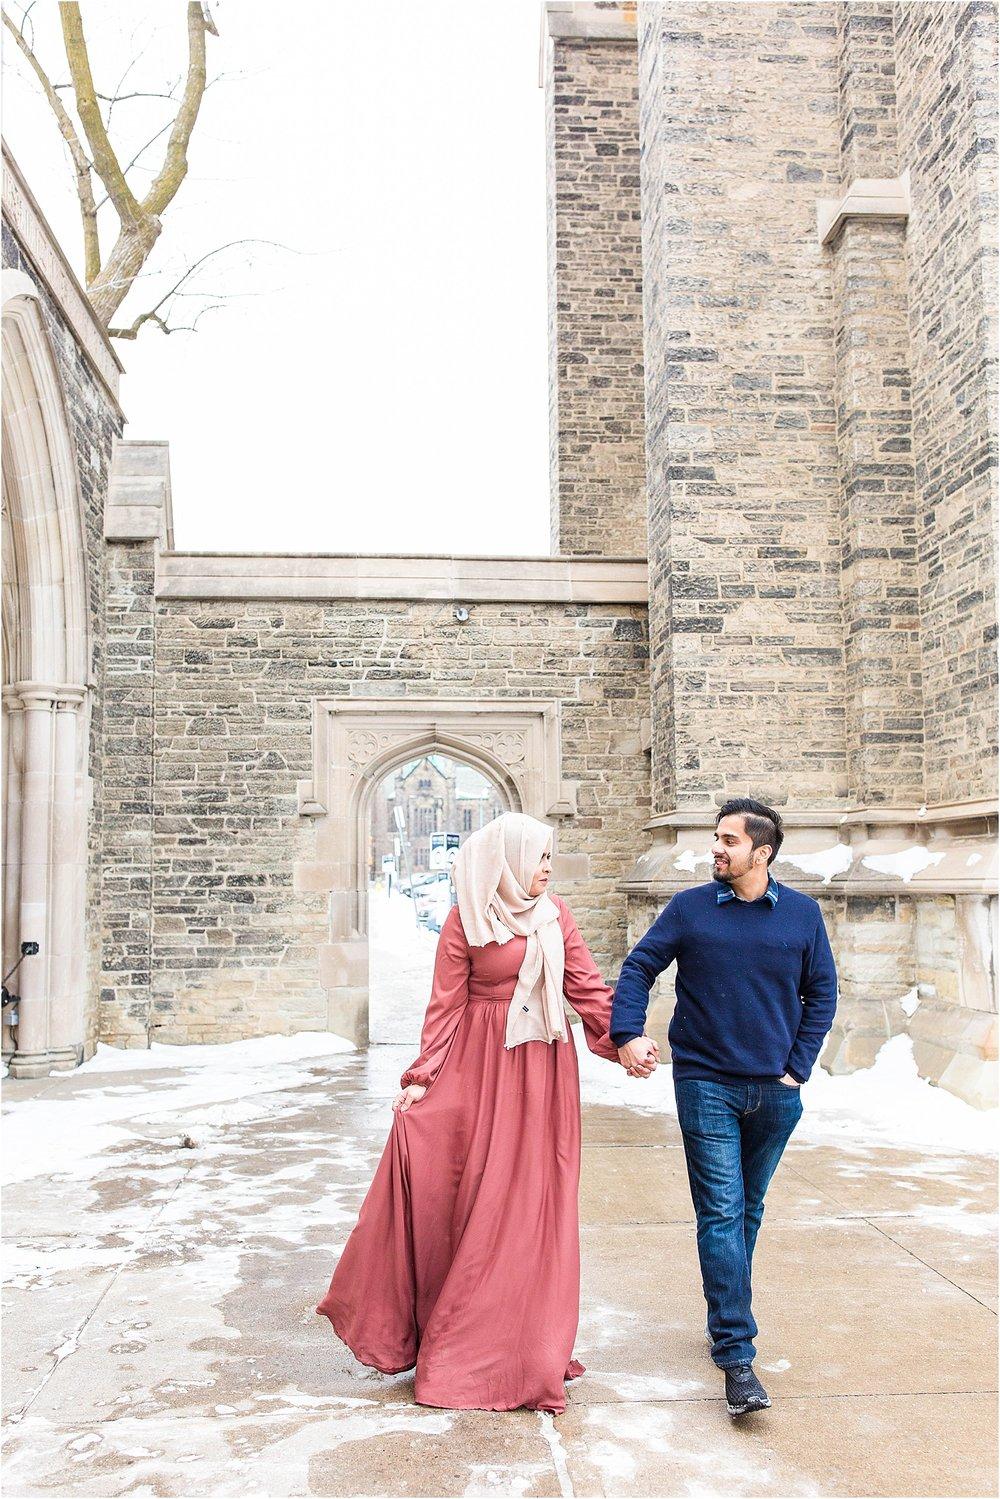 Graffiti-Alley-U-of-T-Engagement-Session-Toronto-Mississauga-Brampton-Scarborough-GTA-Pakistani-Indian-Wedding-Engagement-Photographer-Photography_0026.jpg